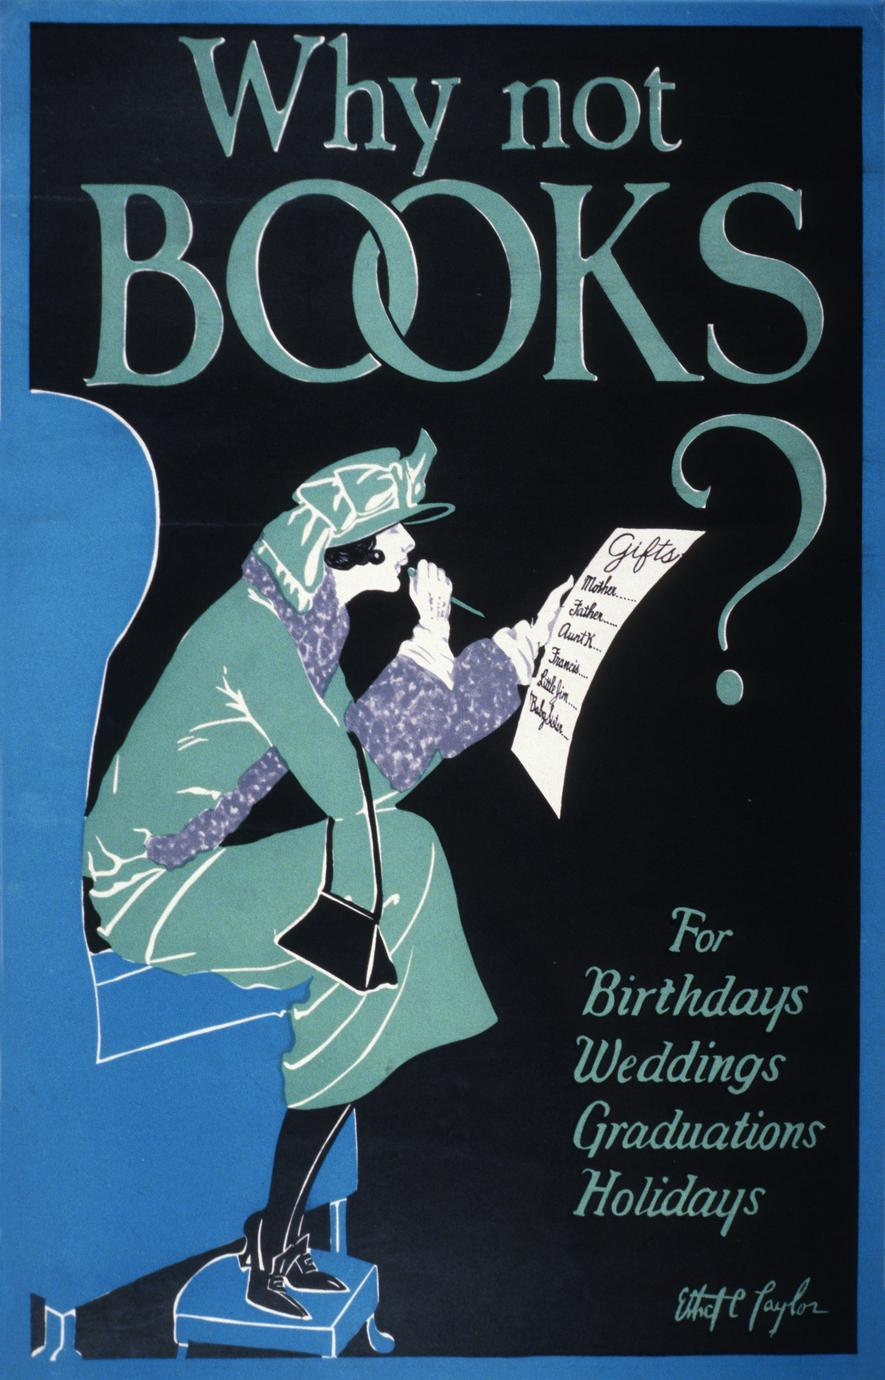 Why not books?  For birithdays, weddings, graduations, holidays